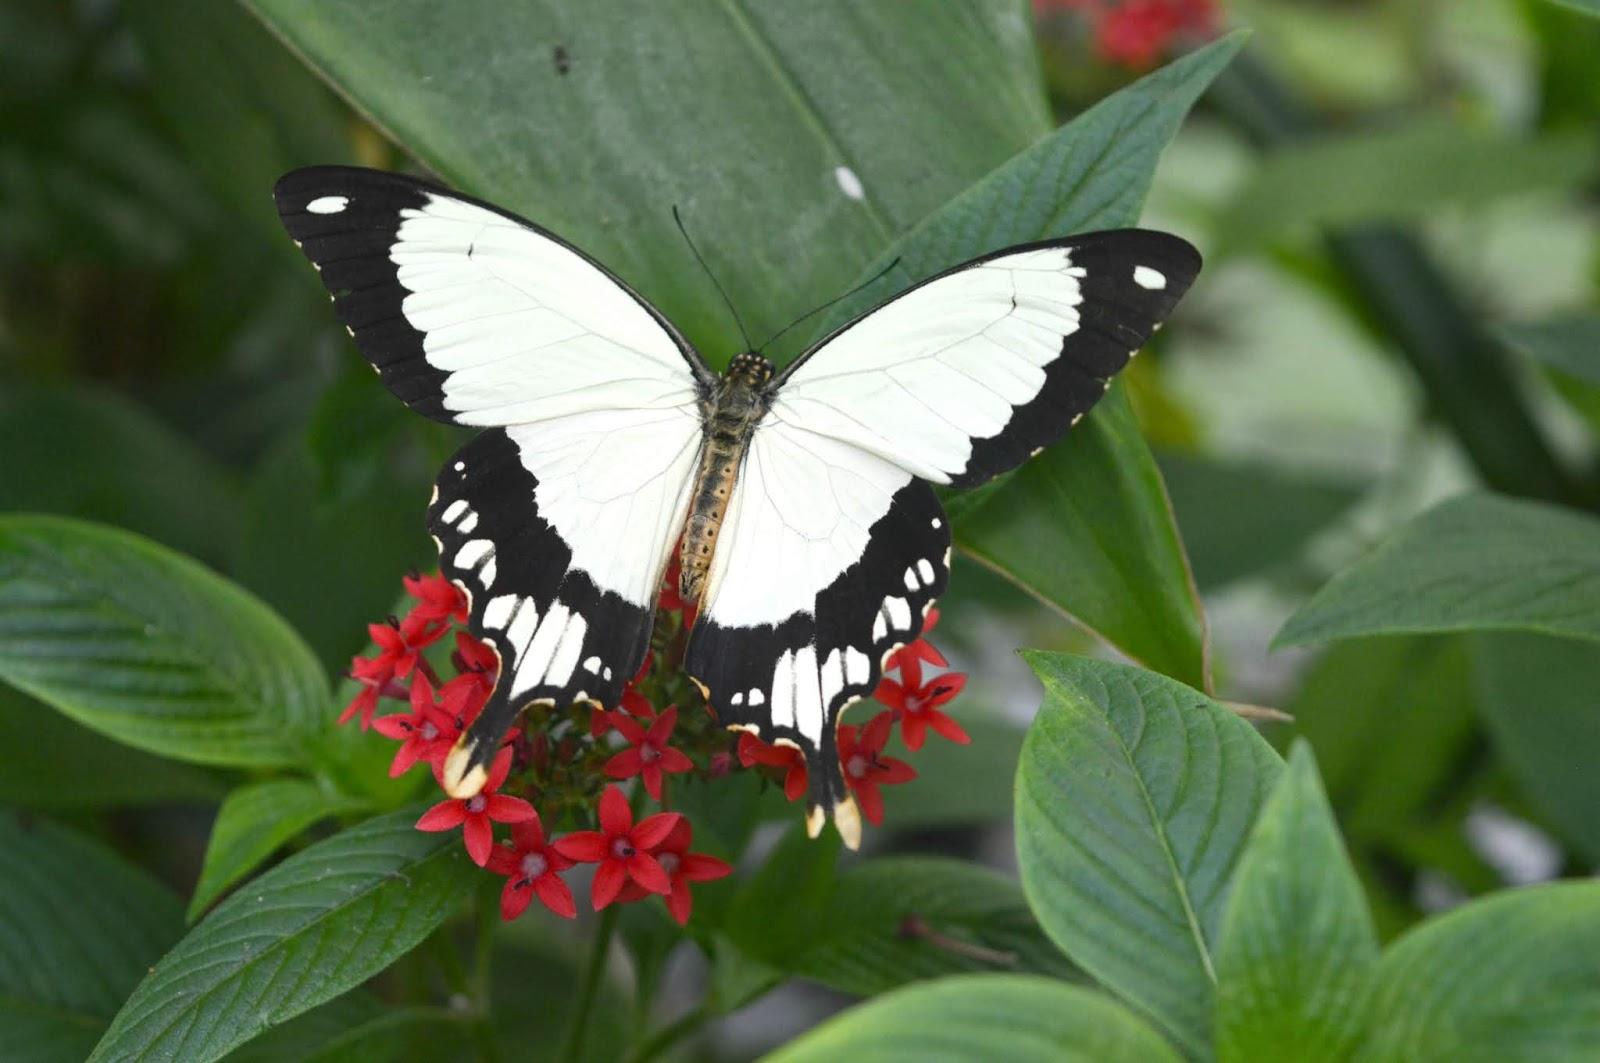 Butterflies Preston Park, Teesside